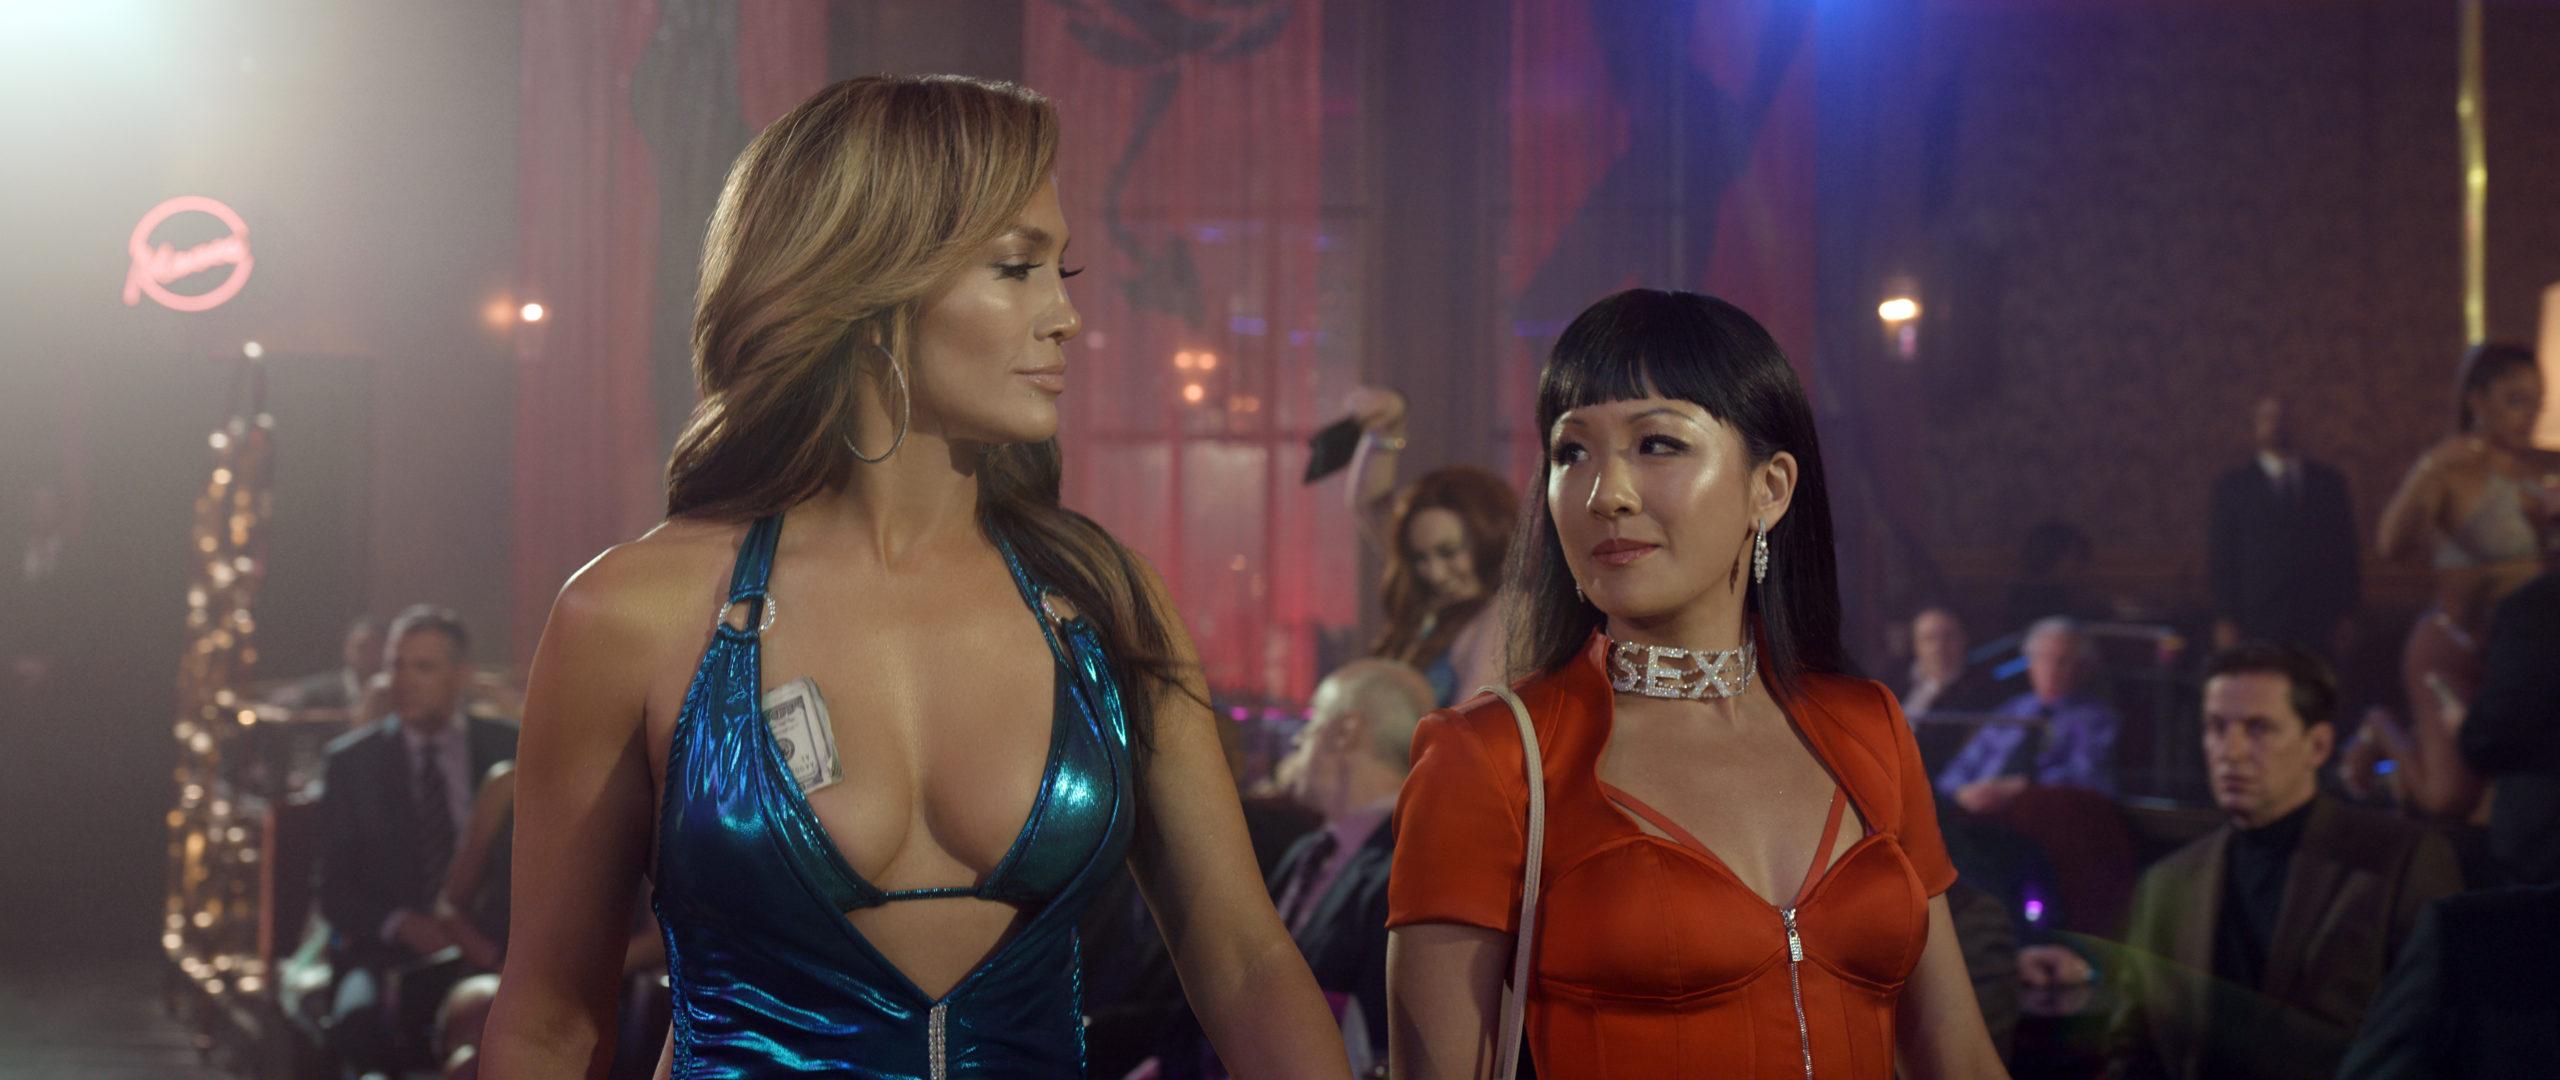 QUEENS HUSTLERS 2019 de Lorene Scafaria Jennifer Lopez Constance Wu. tire d une histoire vraie; based on a true story d